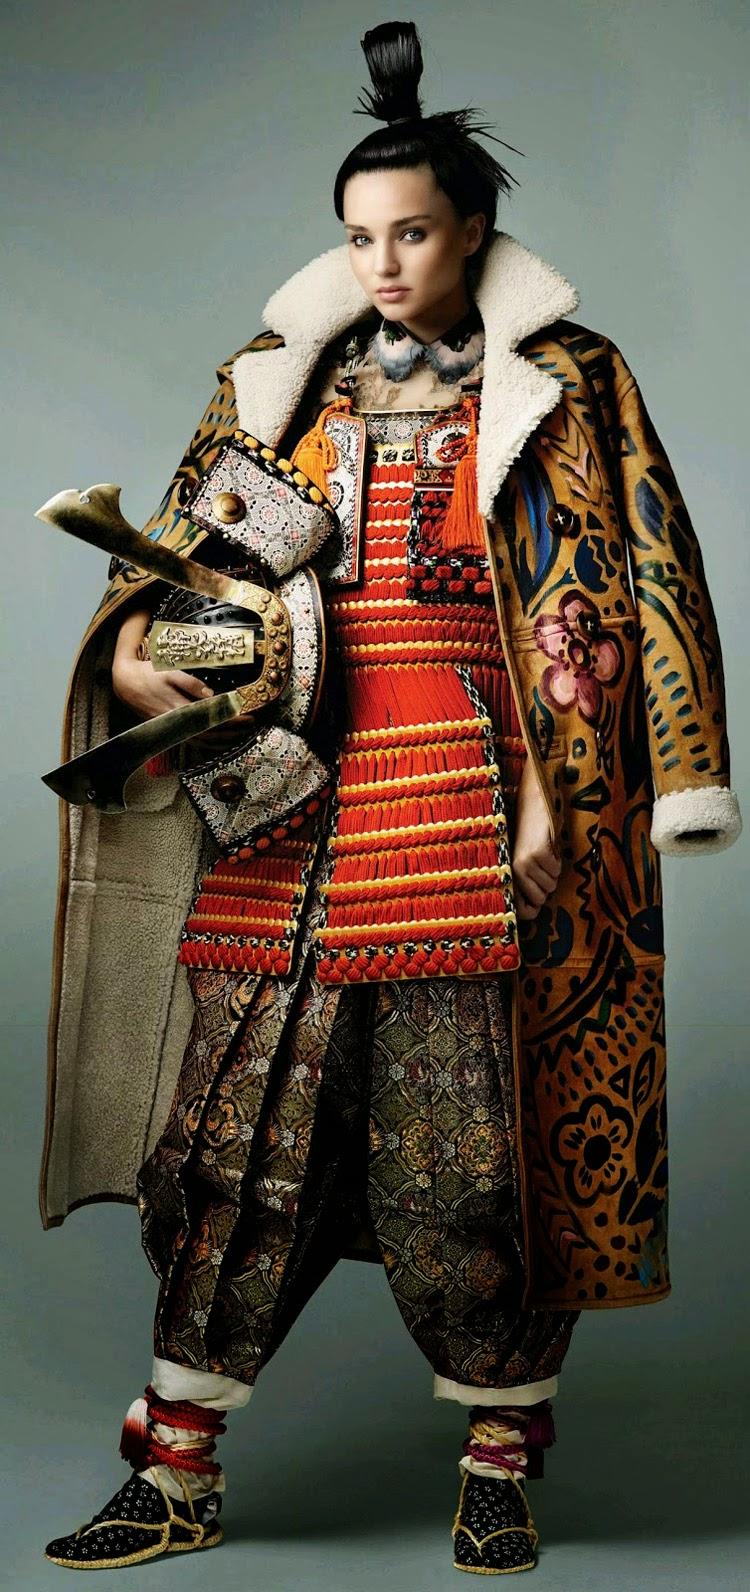 Miranda-Kerr-Vogue-Japan-November-2014-04